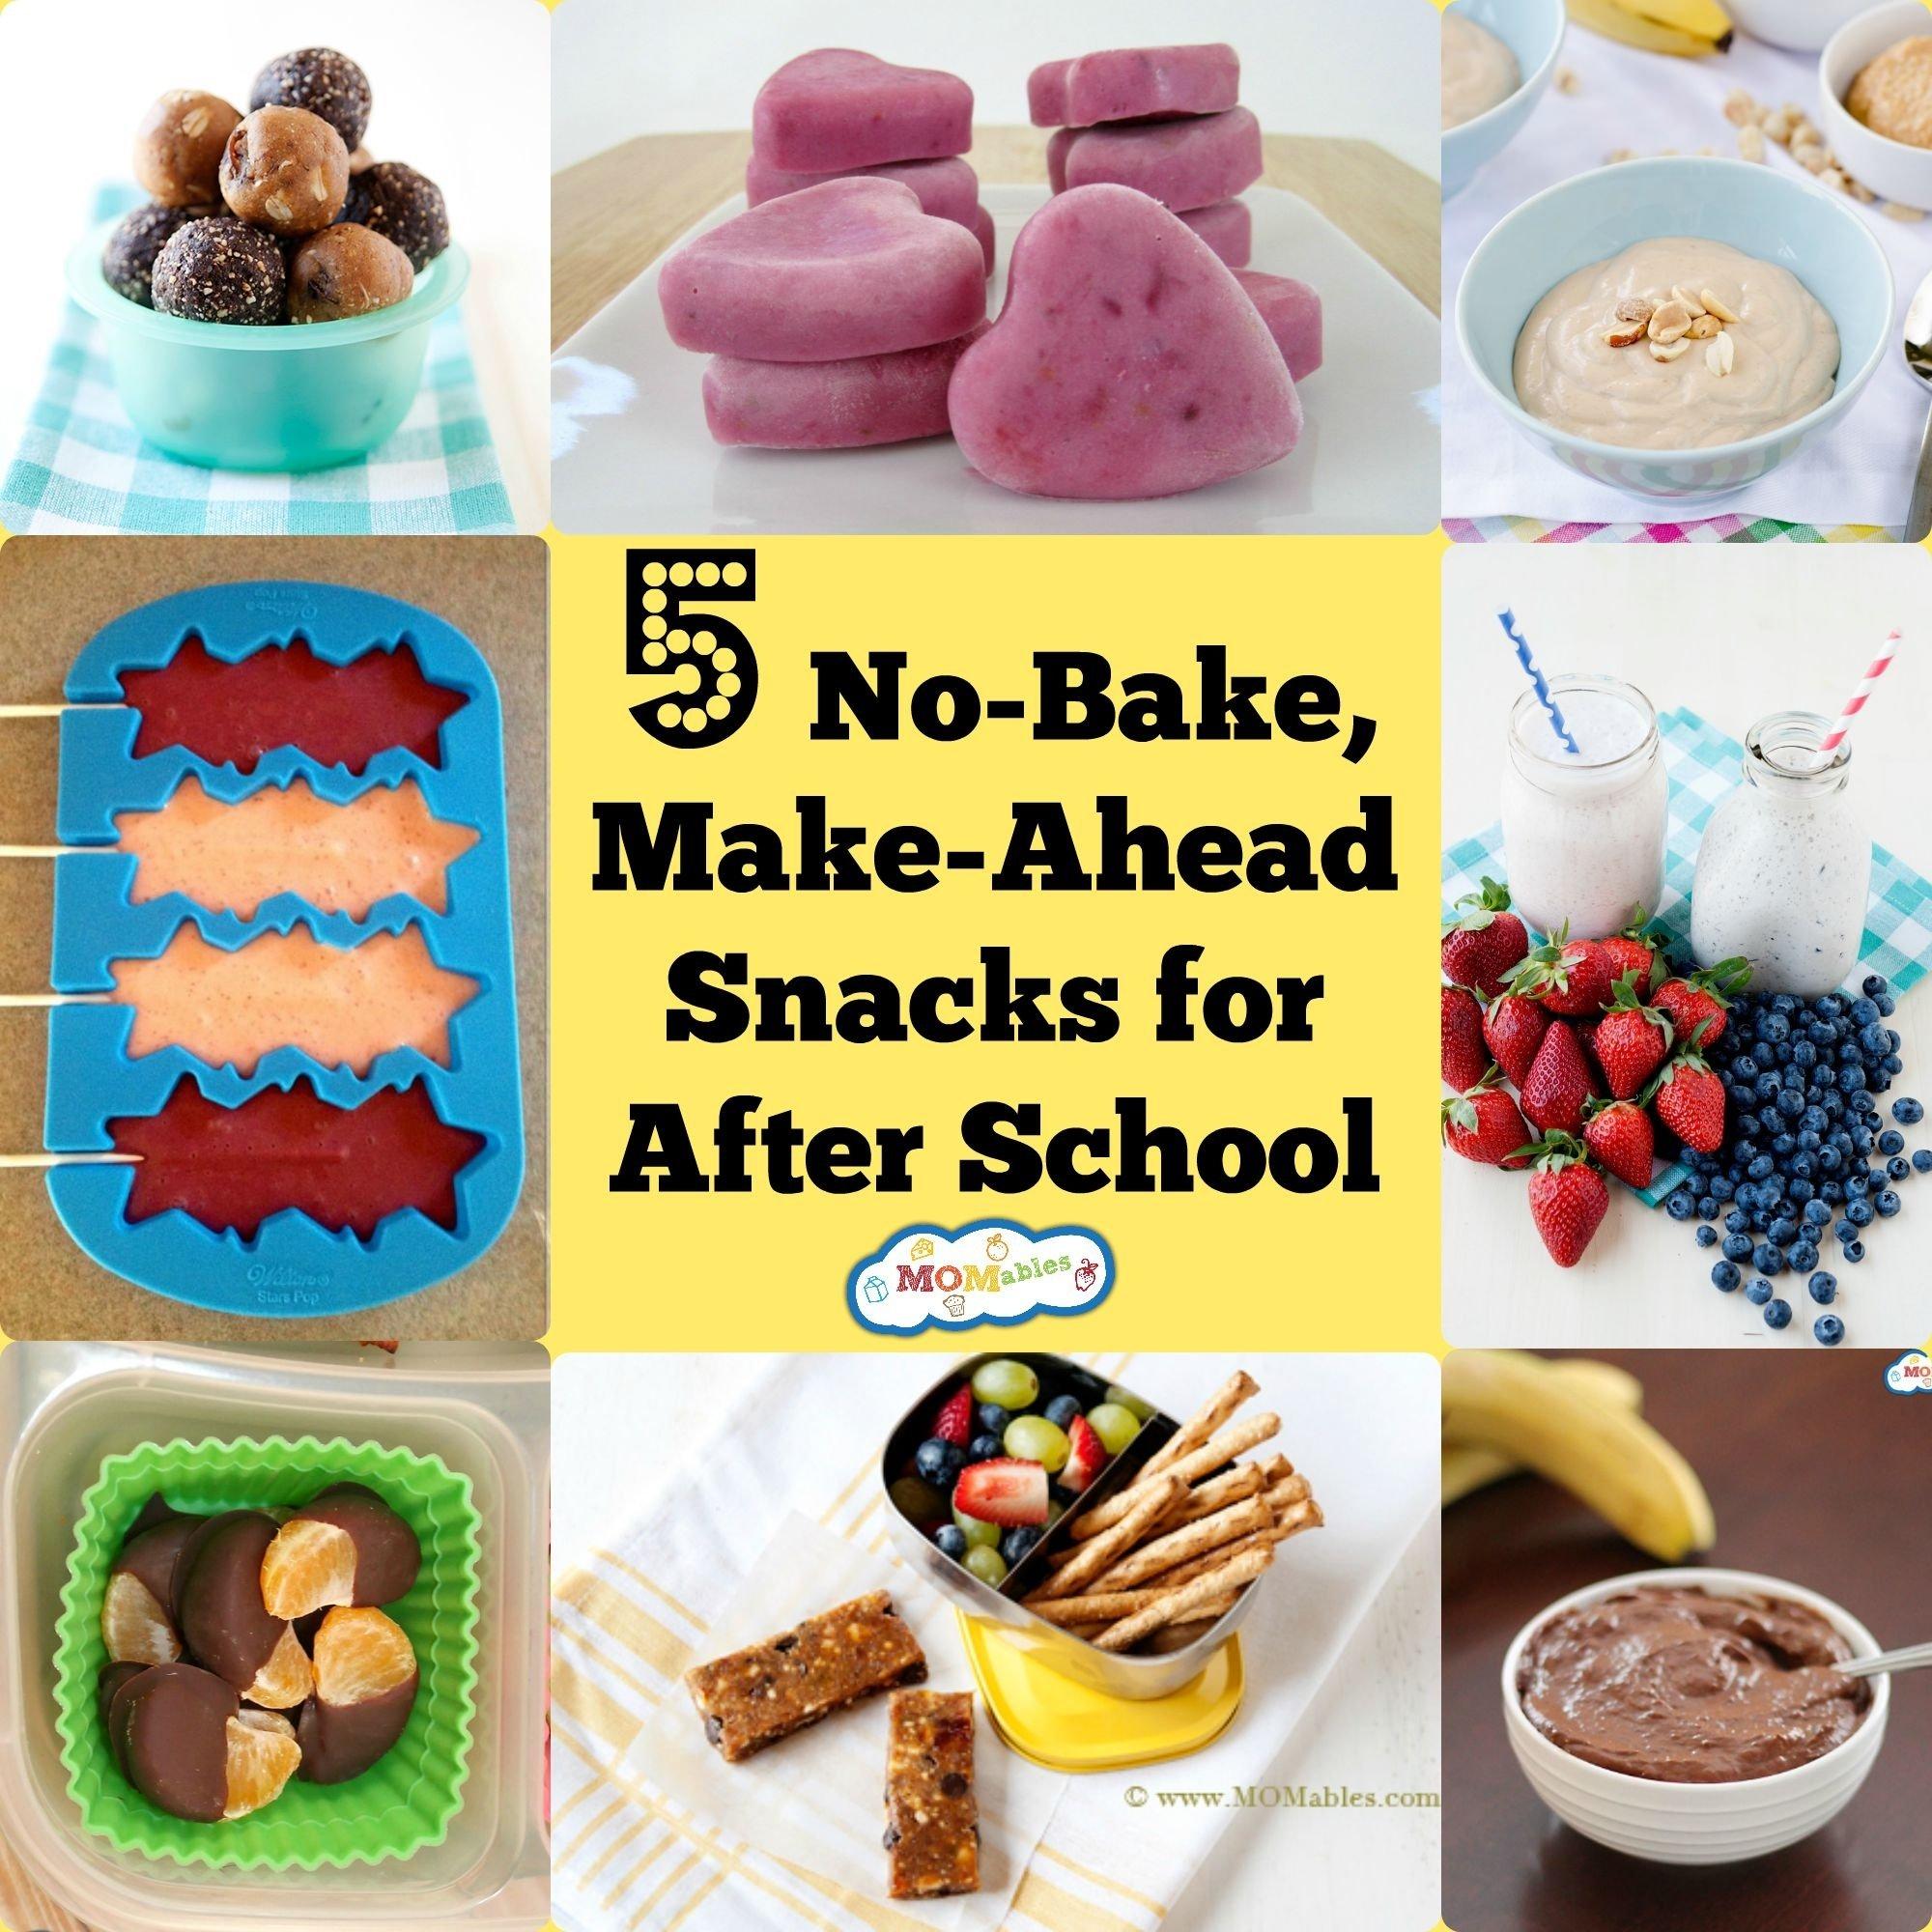 10 Wonderful Bake Sale Ideas For Kids 5 no bake make ahead after school snacks momables 2020